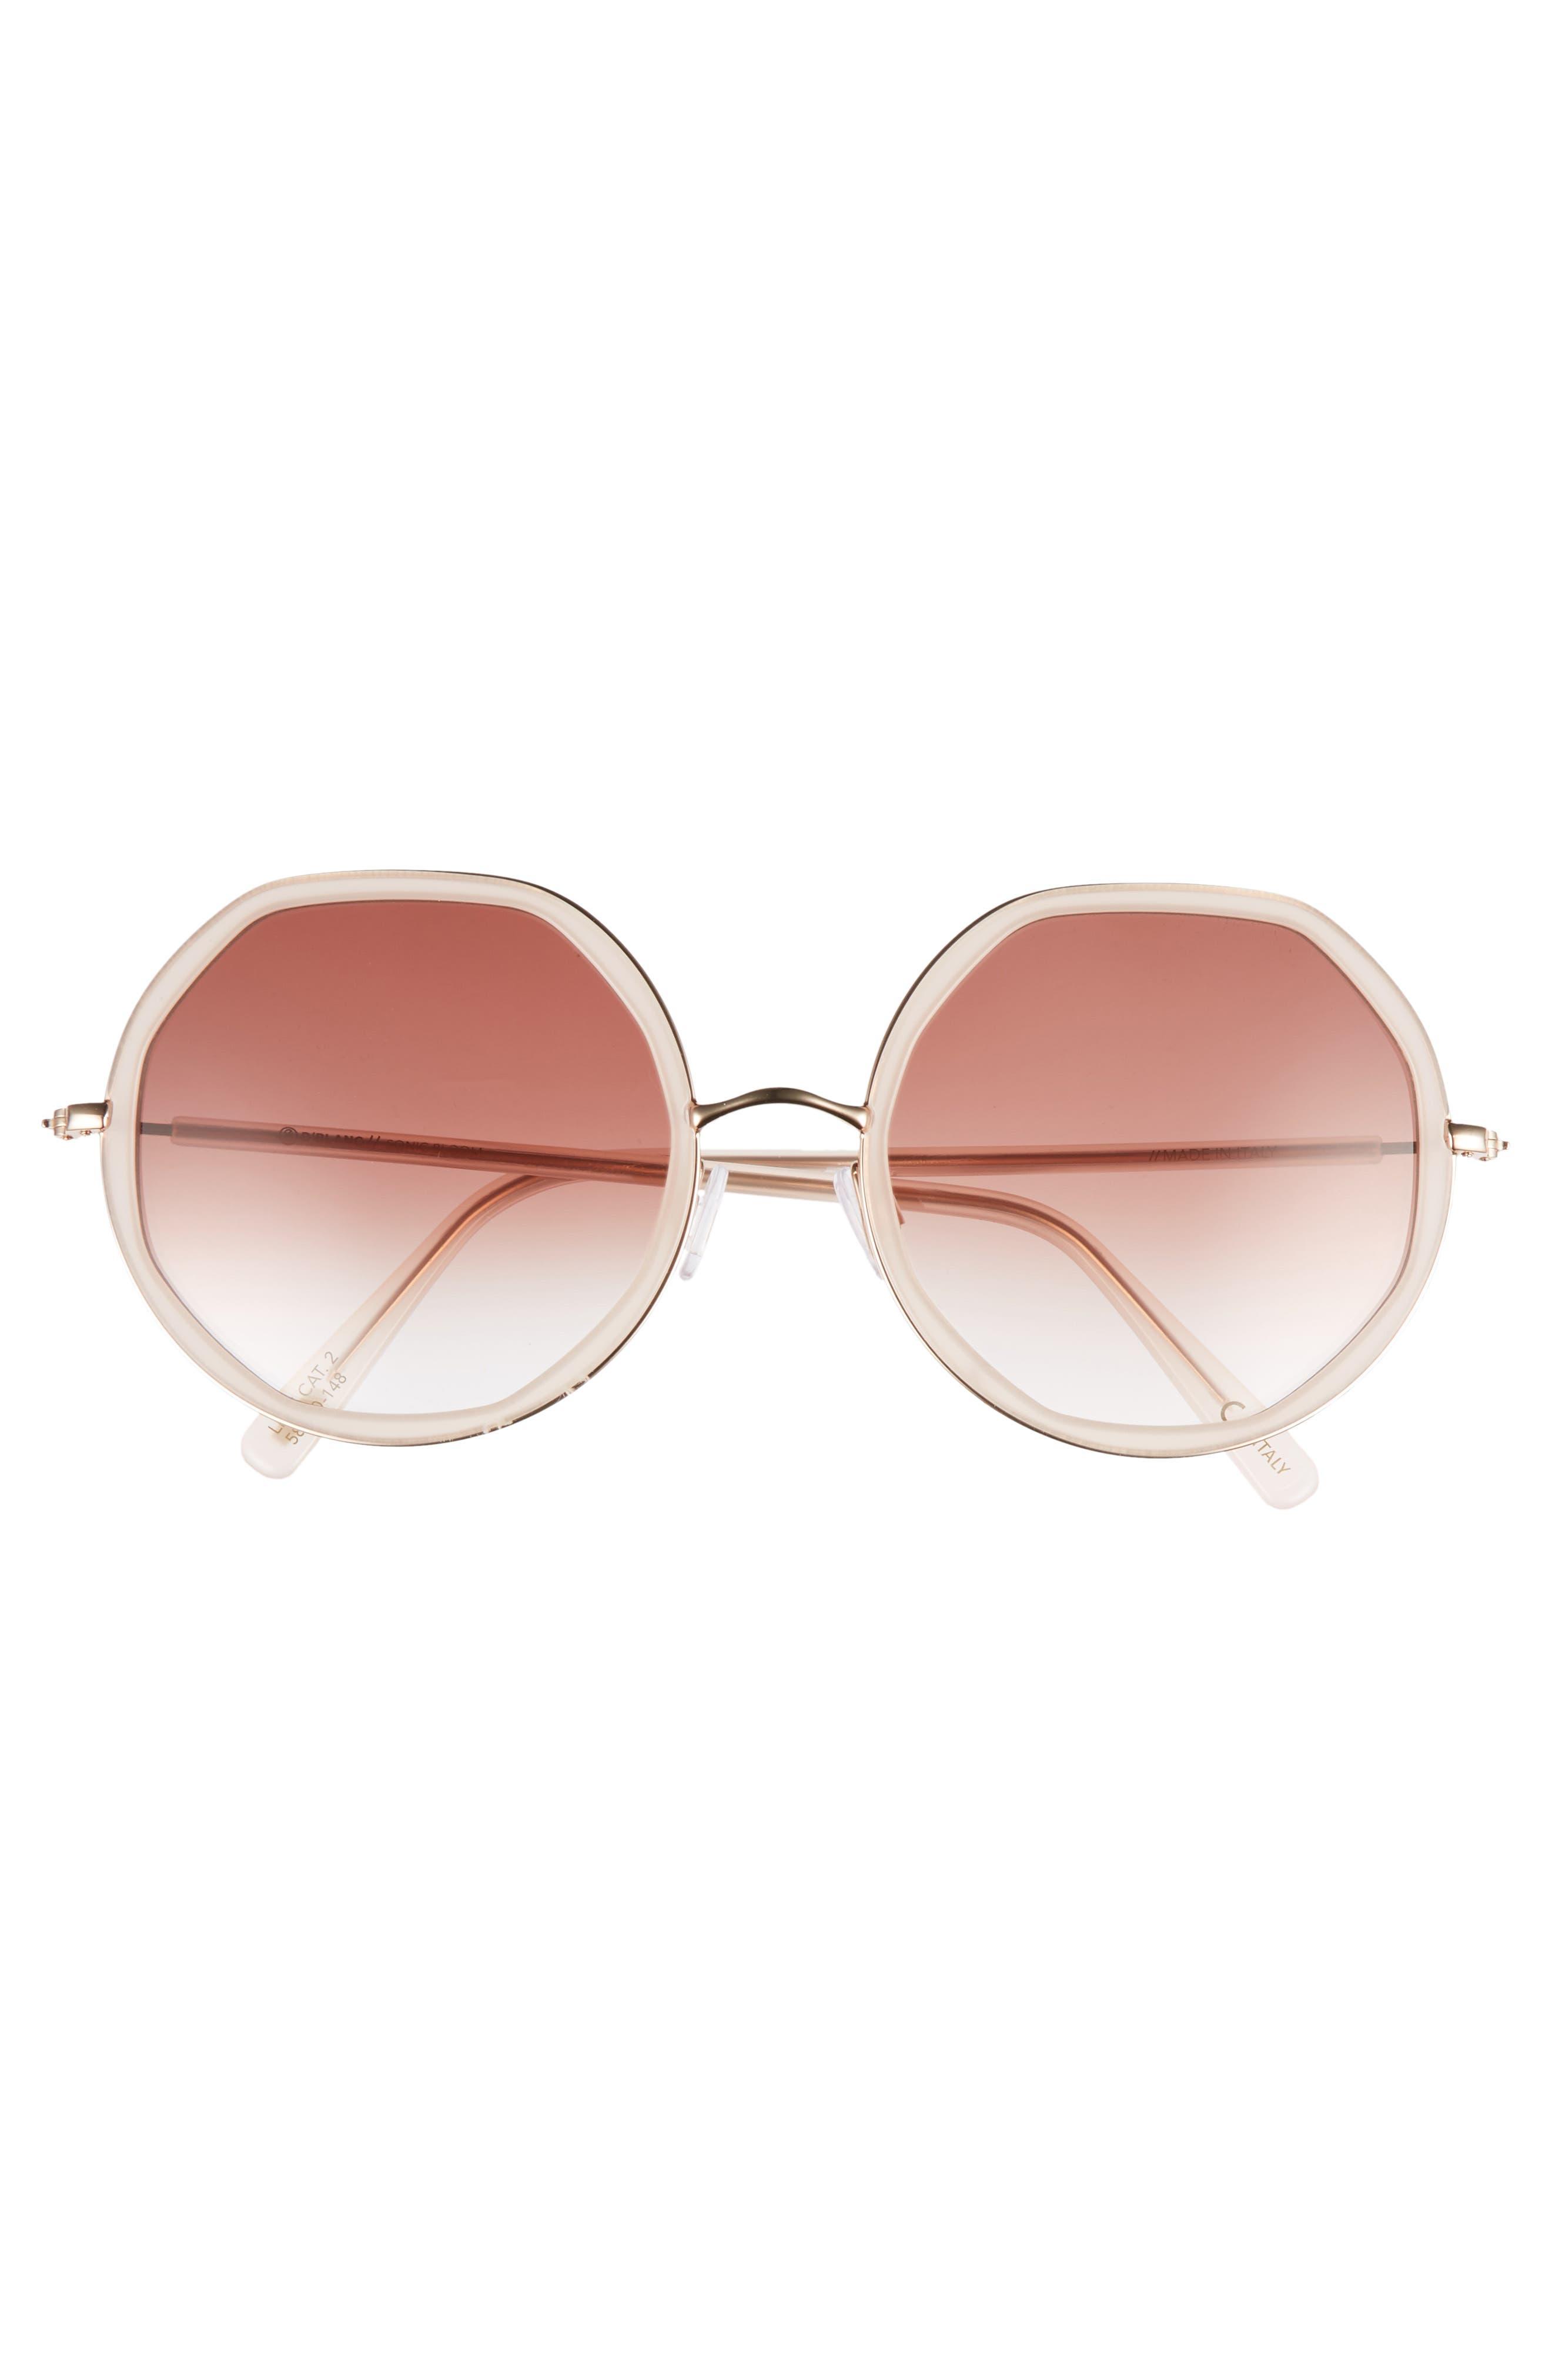 D'BLANC Sonic Bloom 58mm Sunglasses,                             Alternate thumbnail 3, color,                             OCTAGON BLUSH